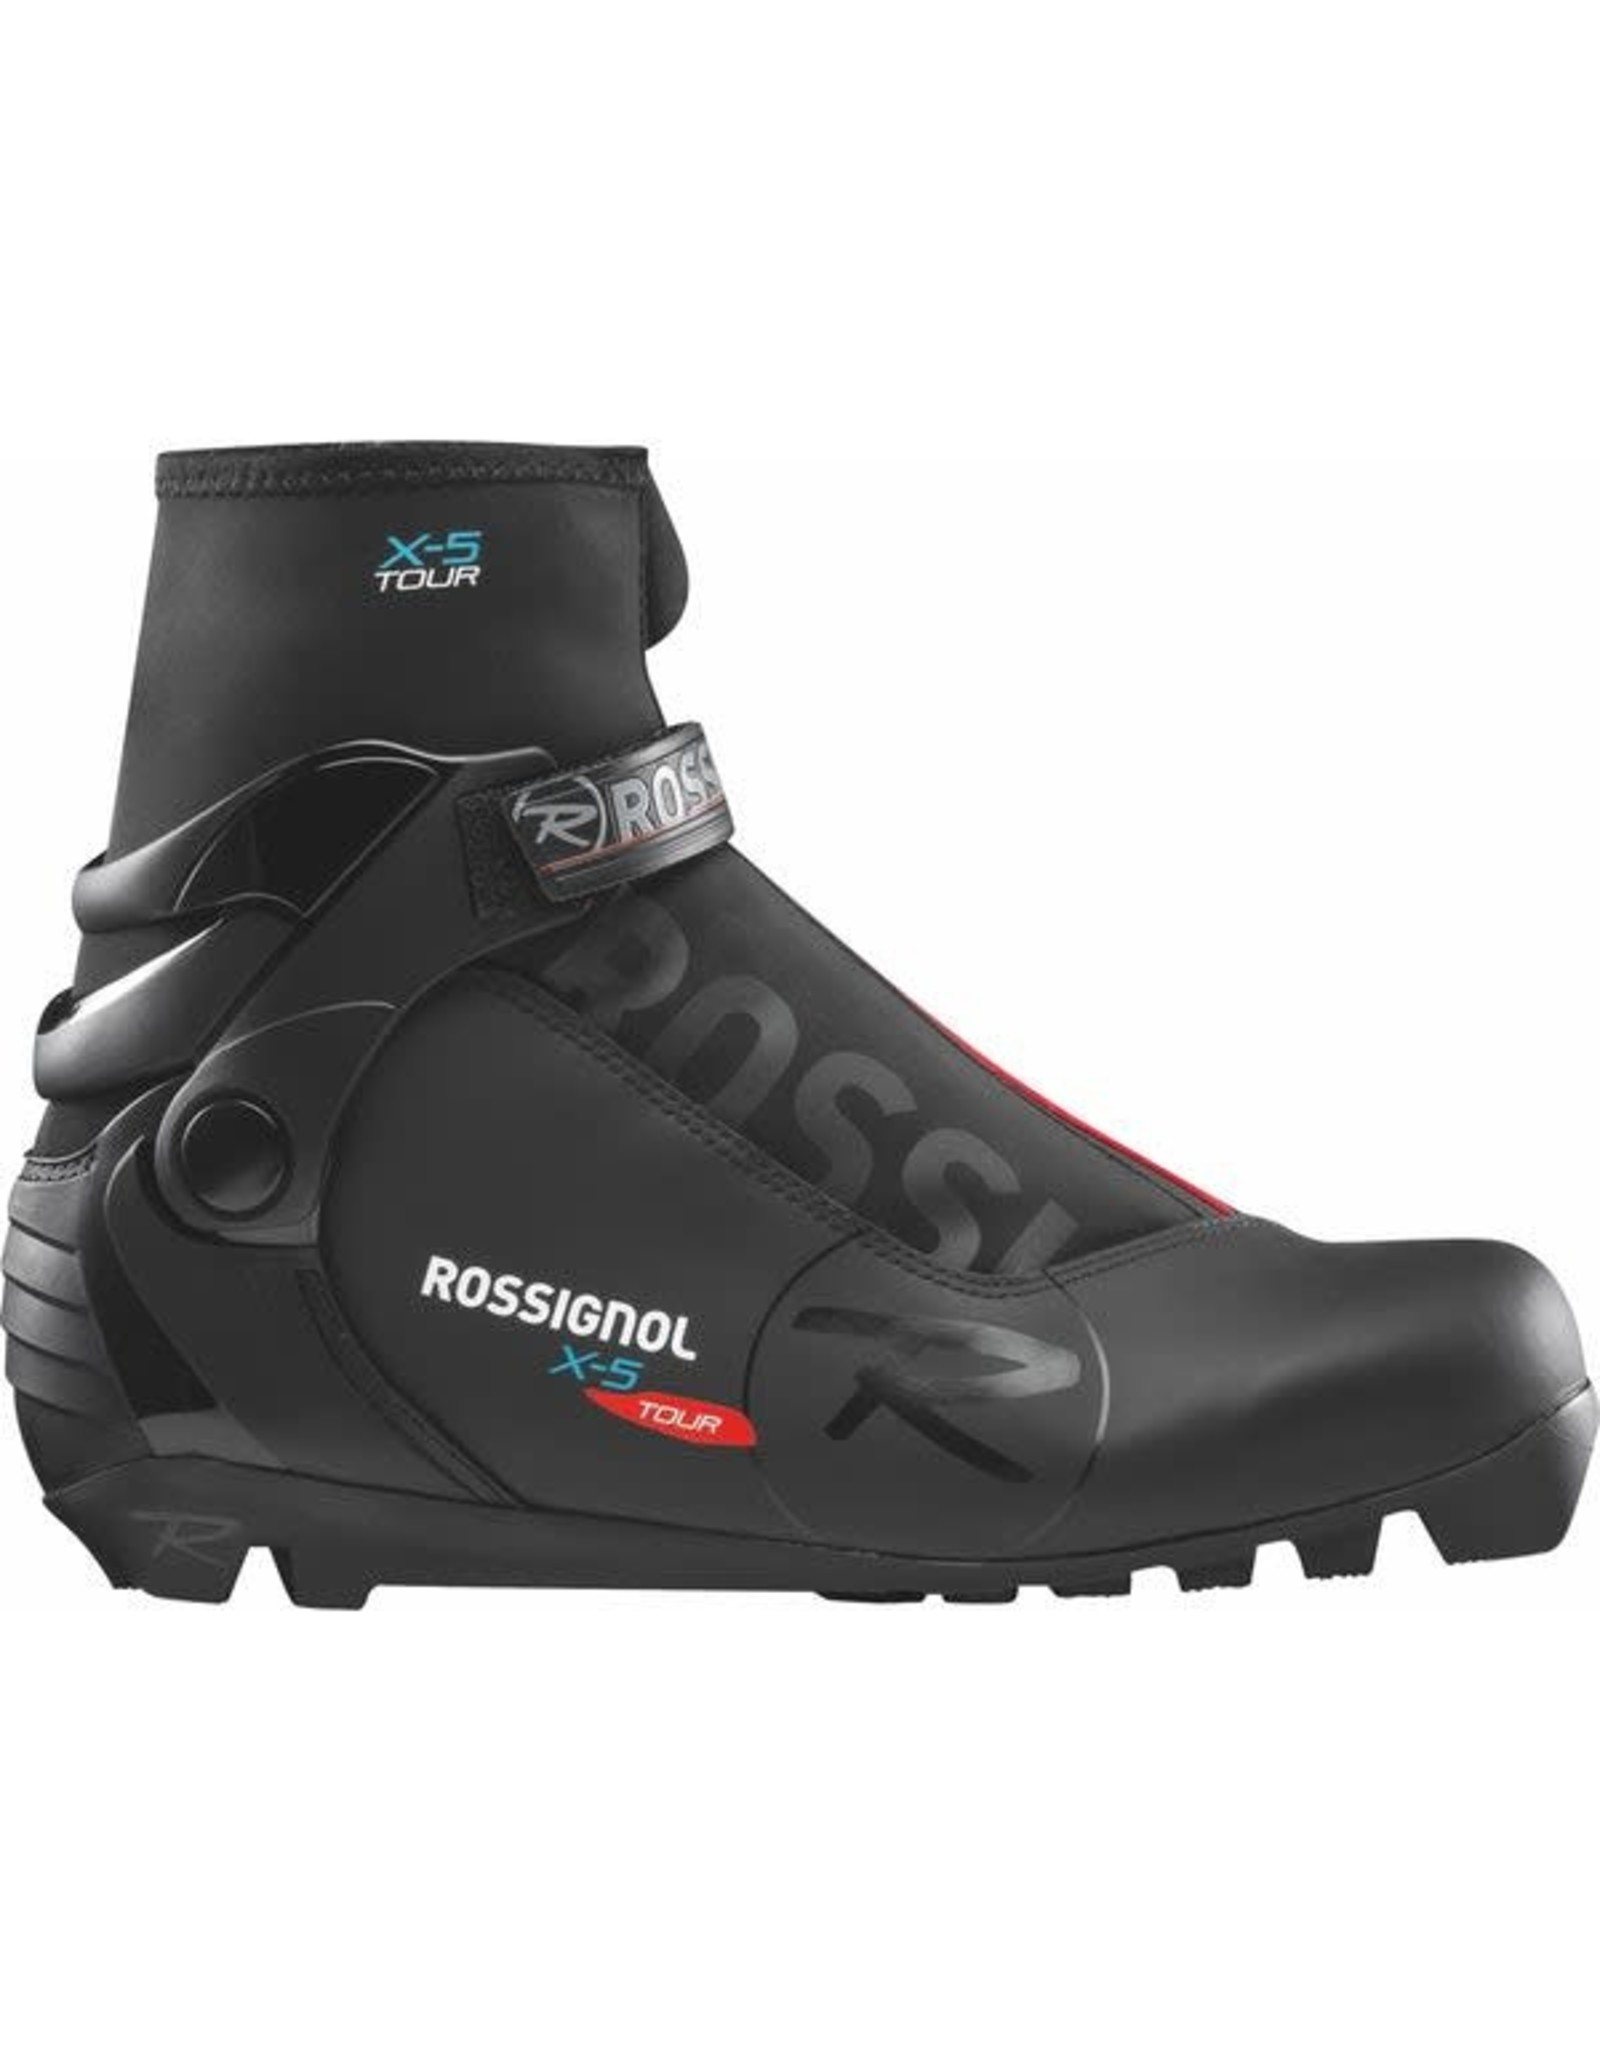 ROSSIGNOL CANADA ROSSIGNOL, Ski Boots, Touring, X-5 2018